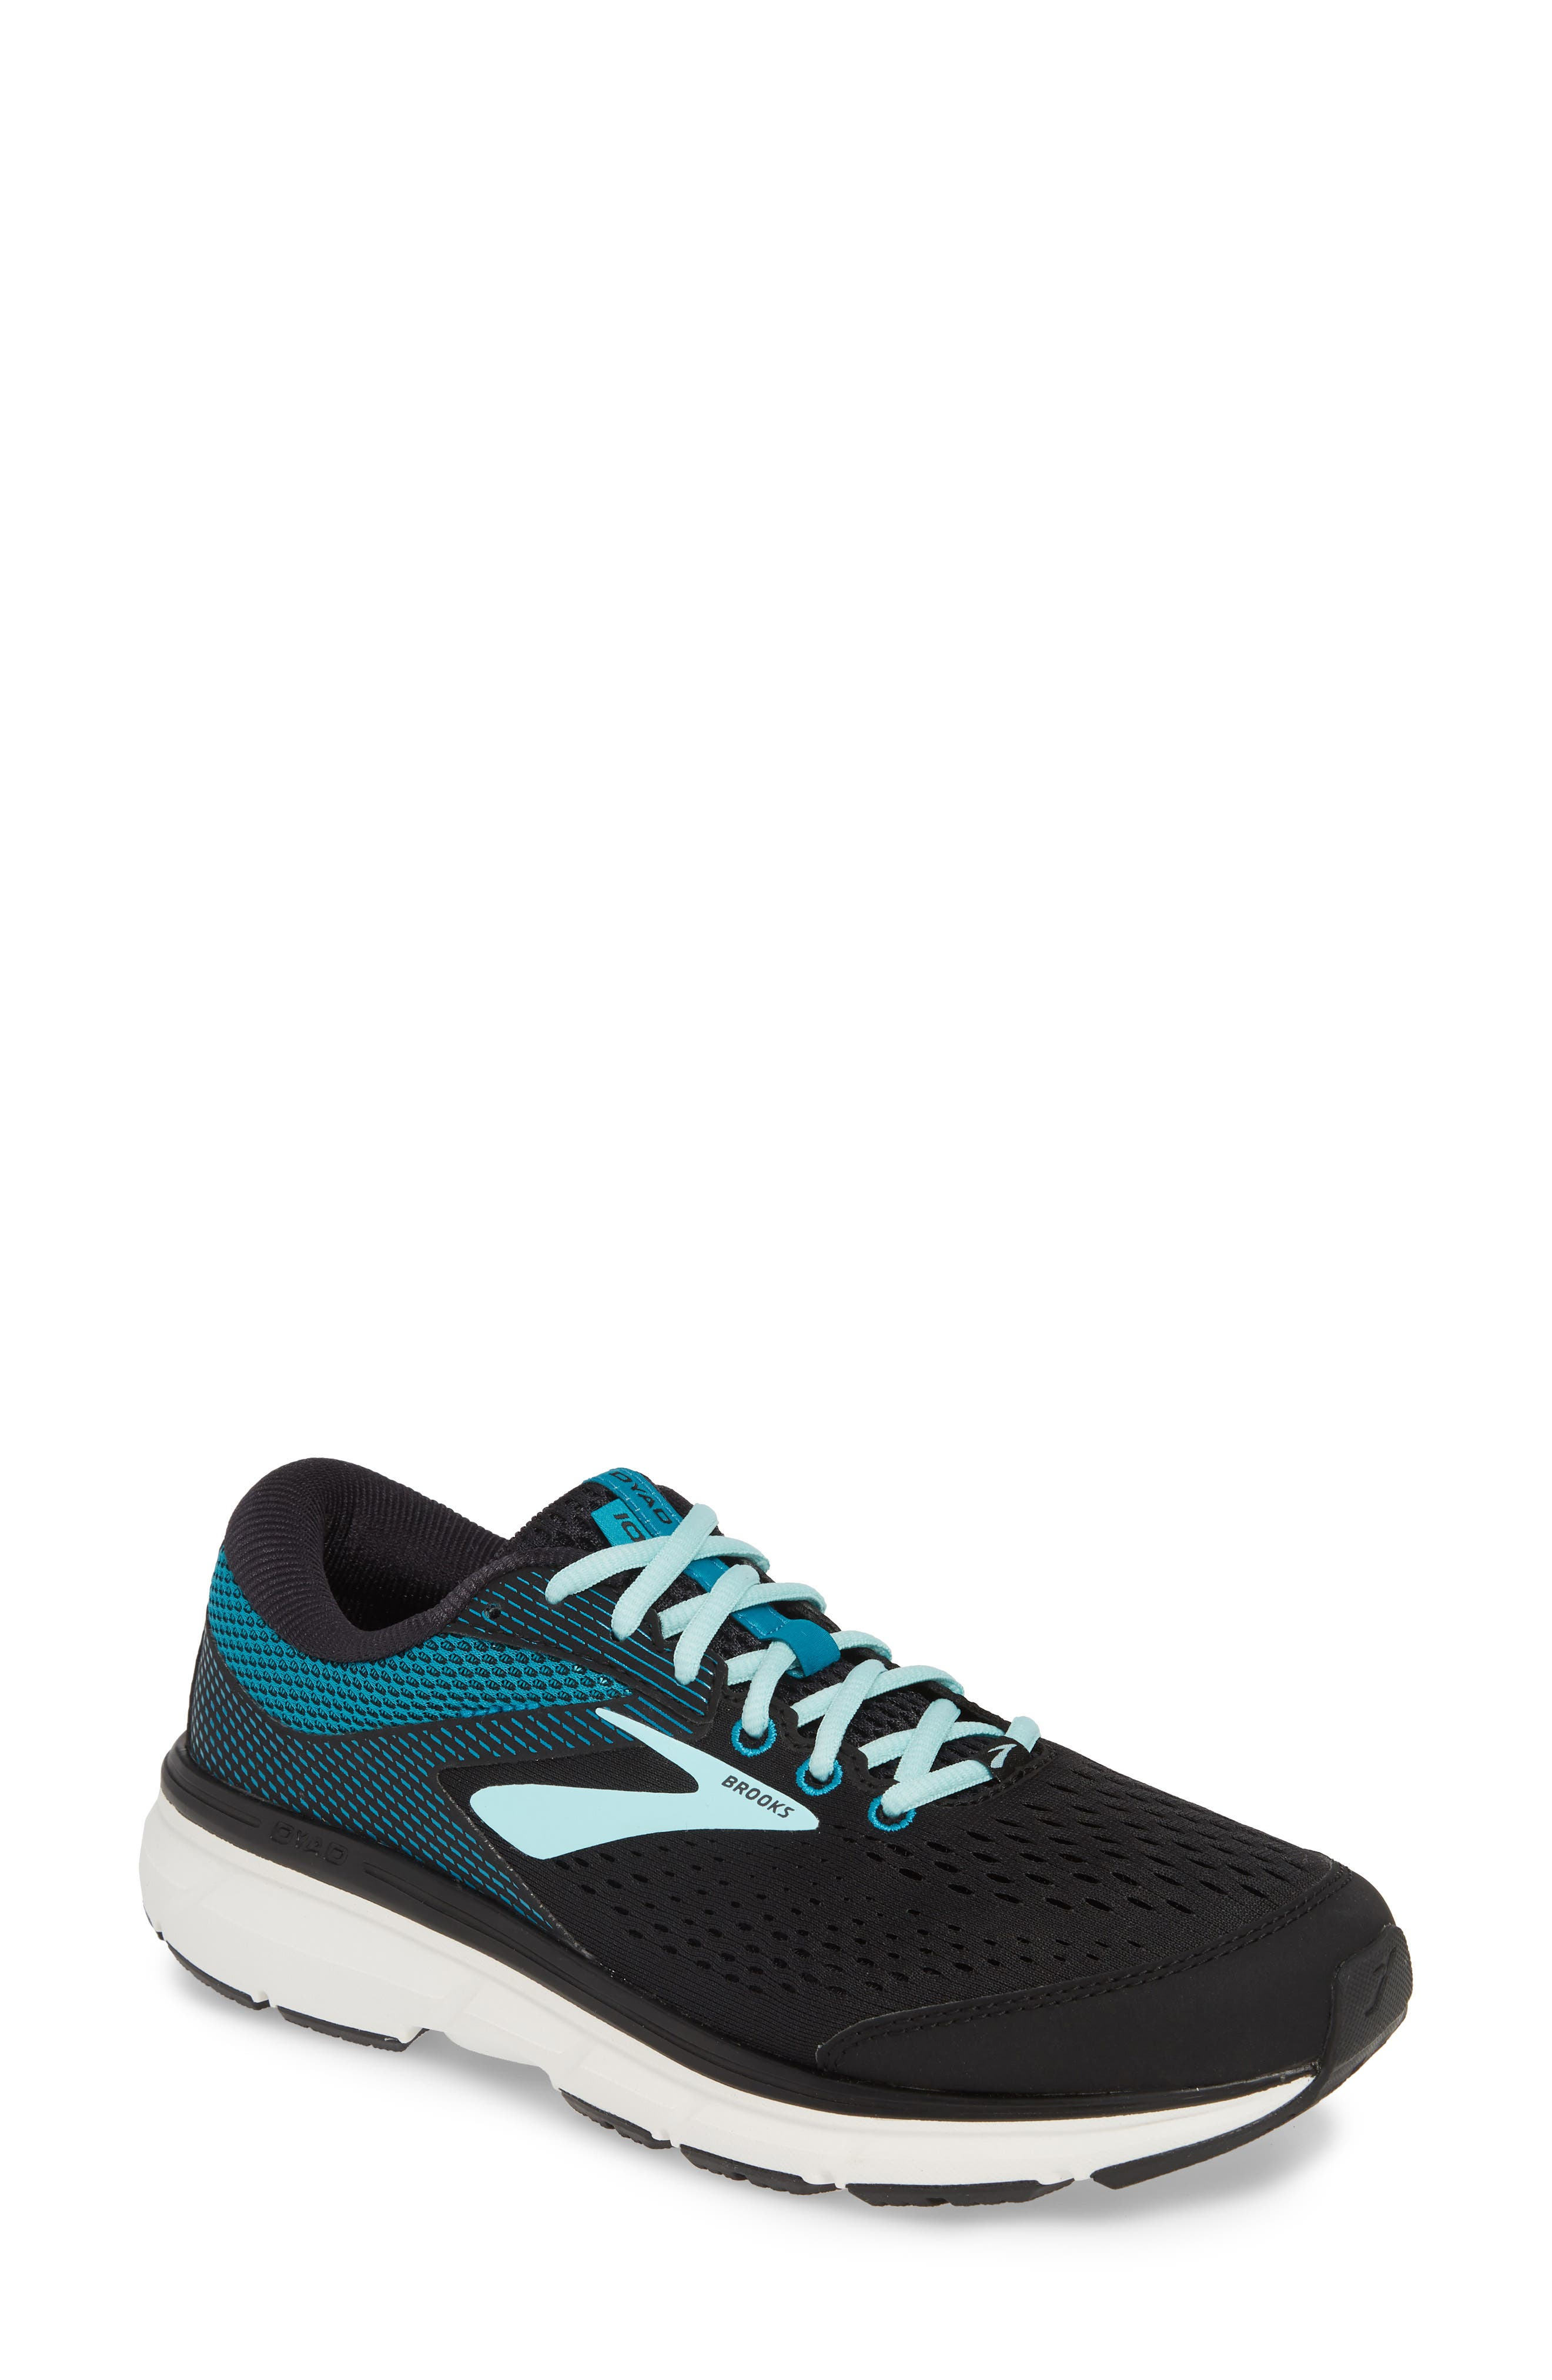 Brooks Dyad 10 Running Shoe, Black